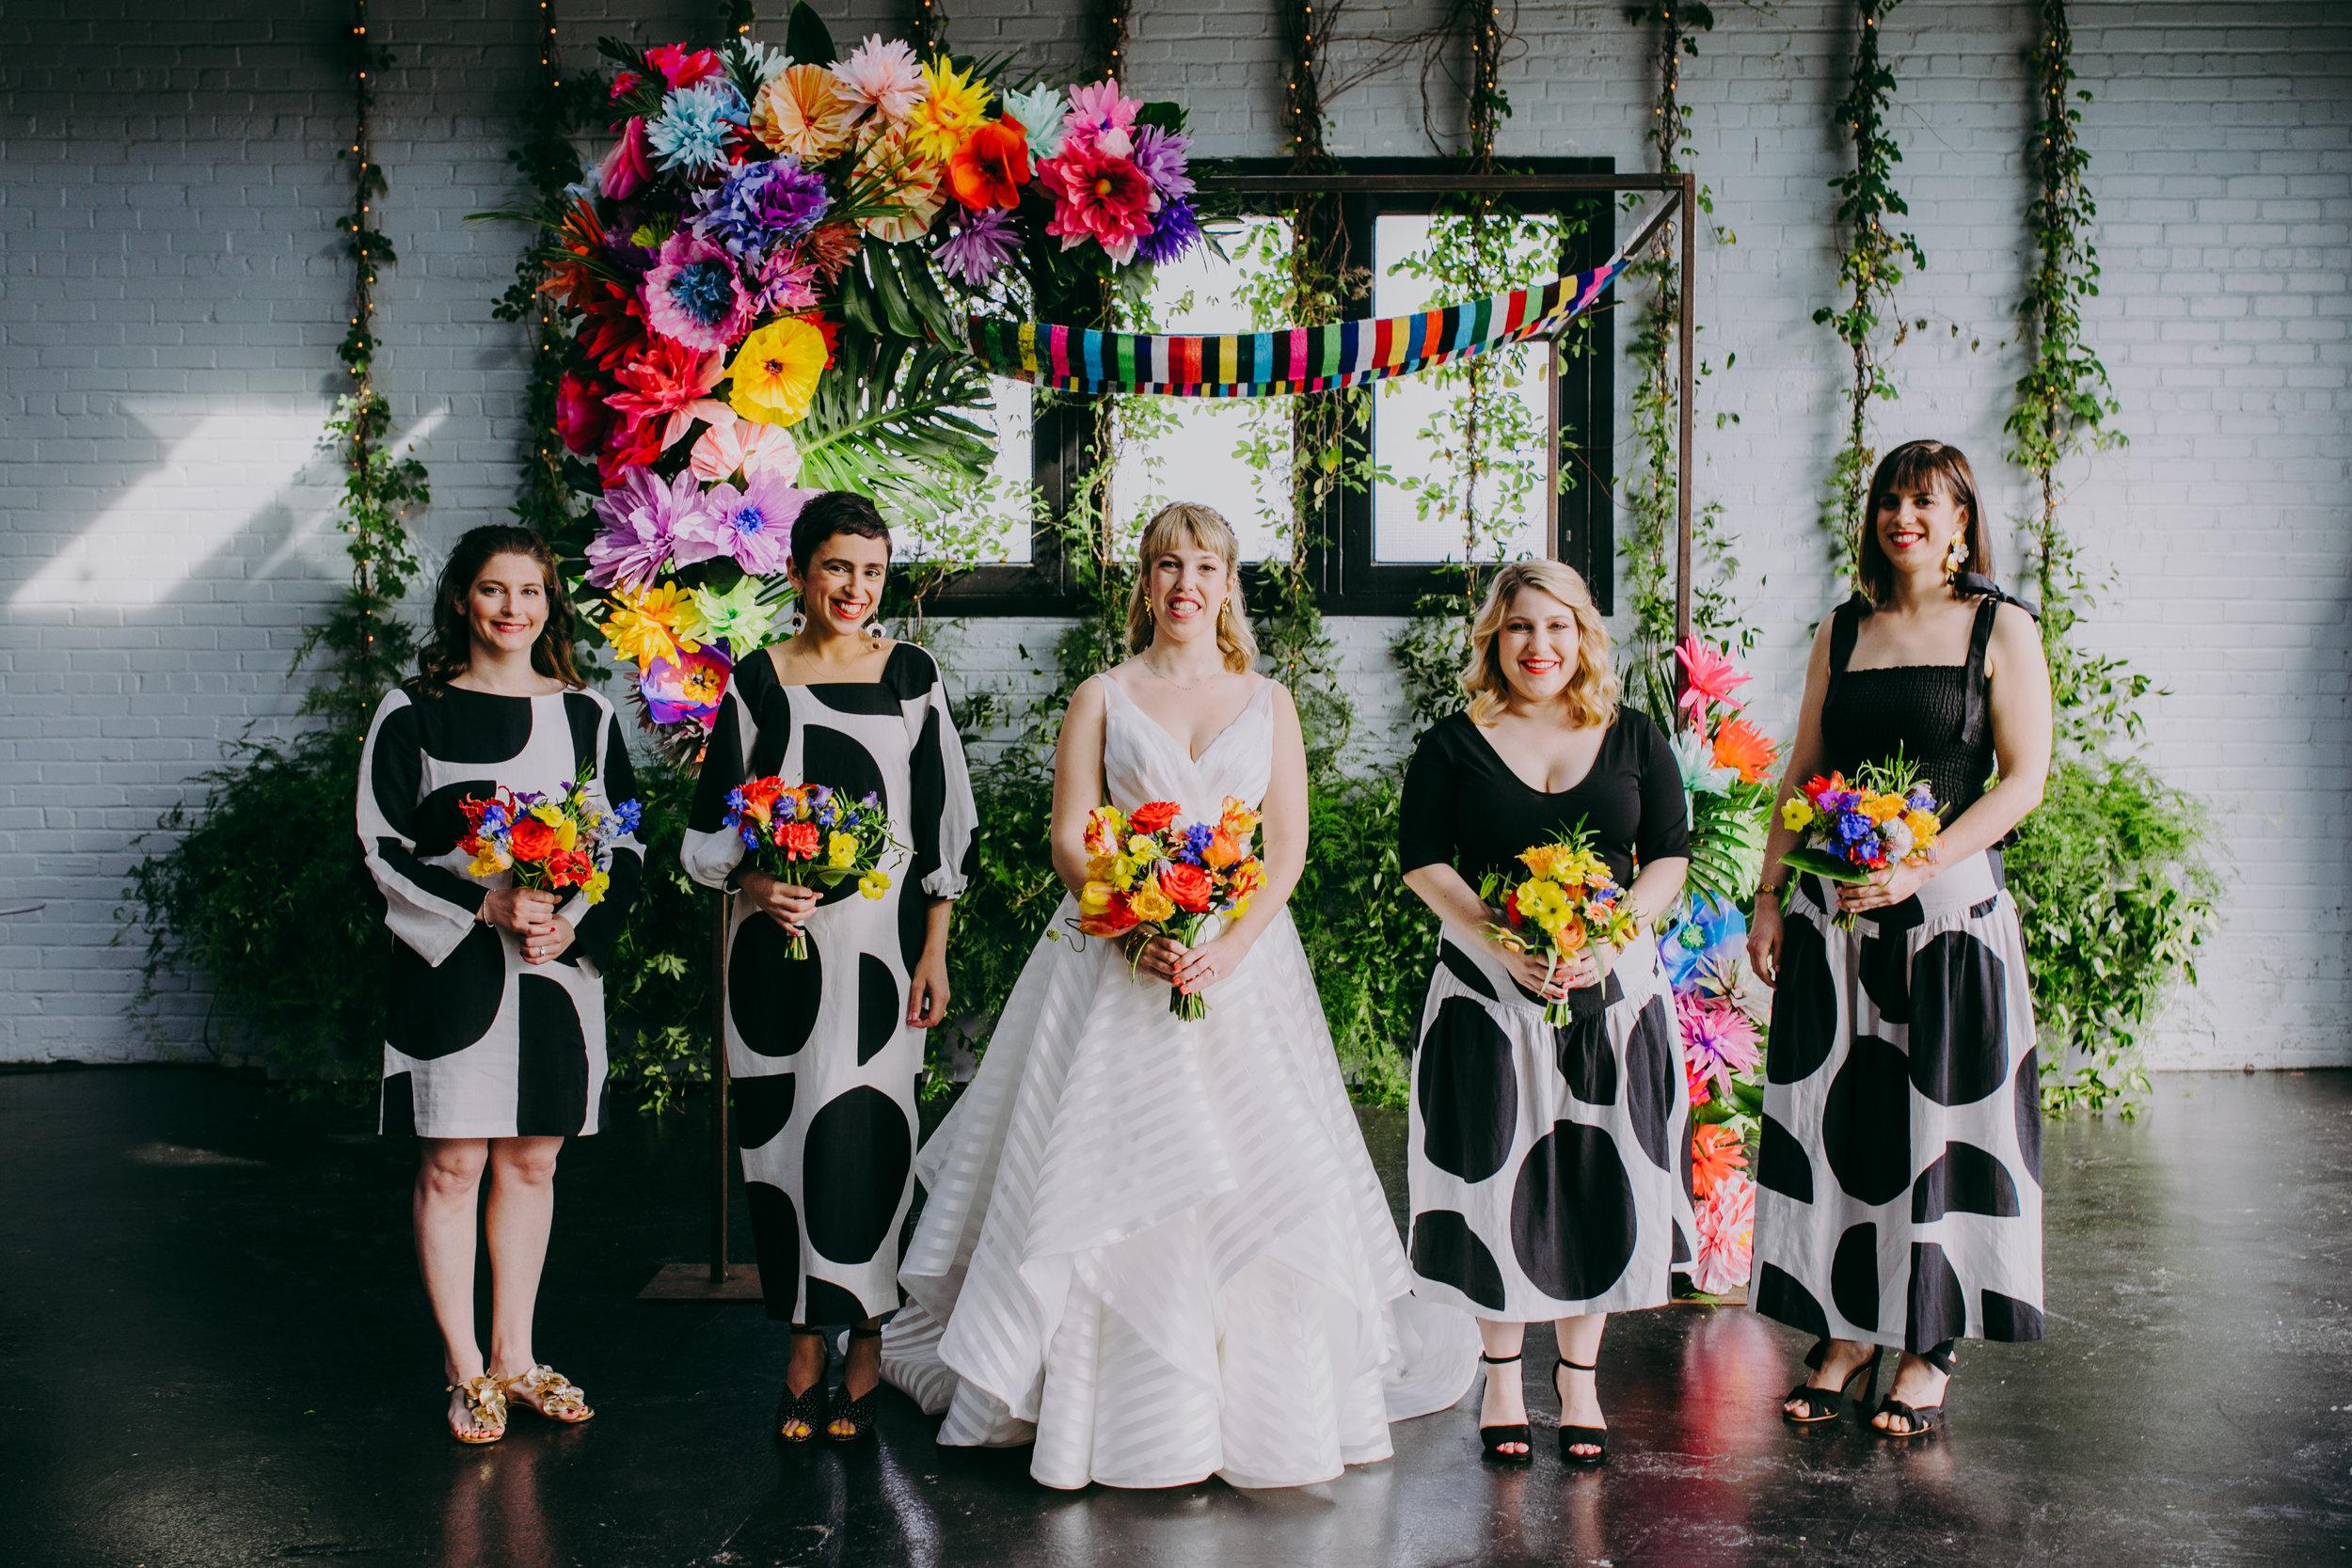 501-union-wedding-photographer-amber-gress-0245.jpg